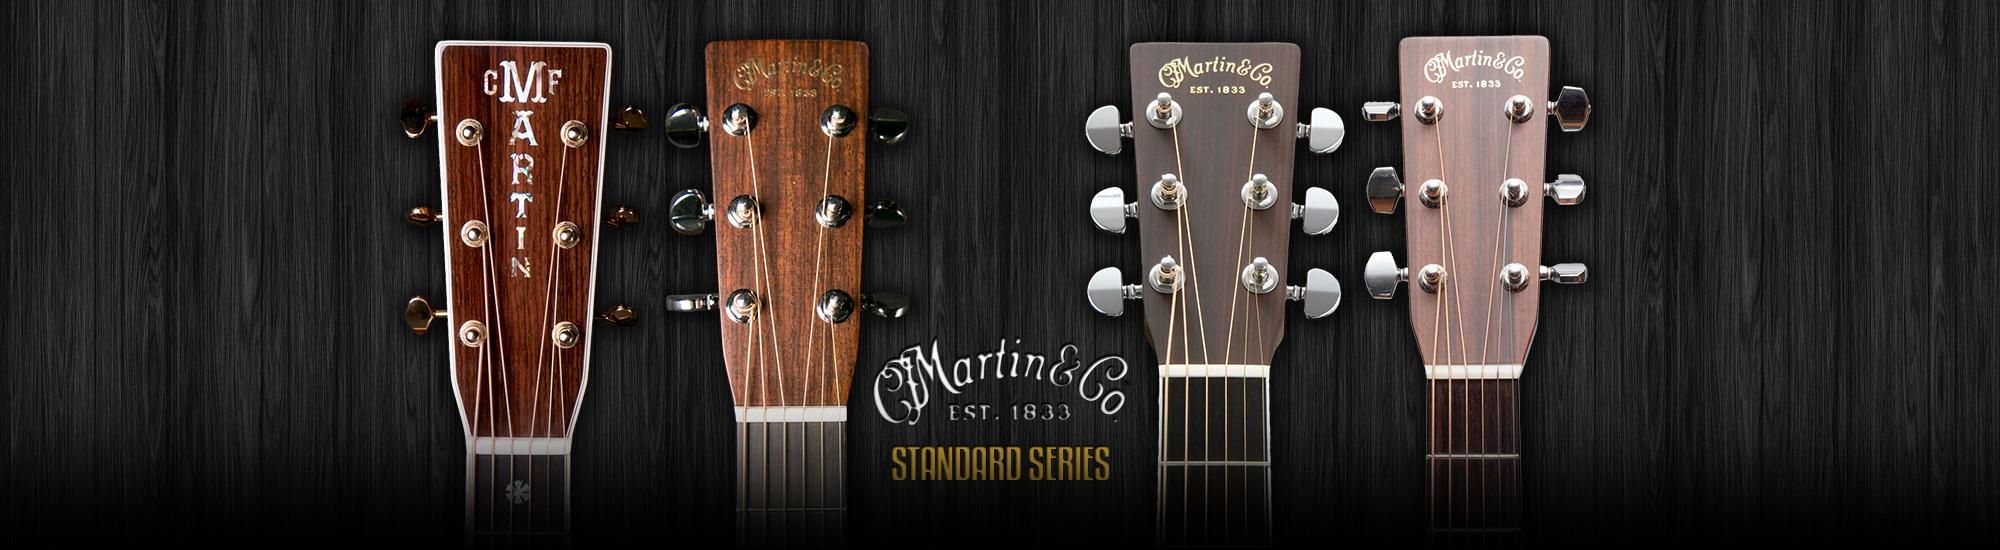 Martin Standard Series